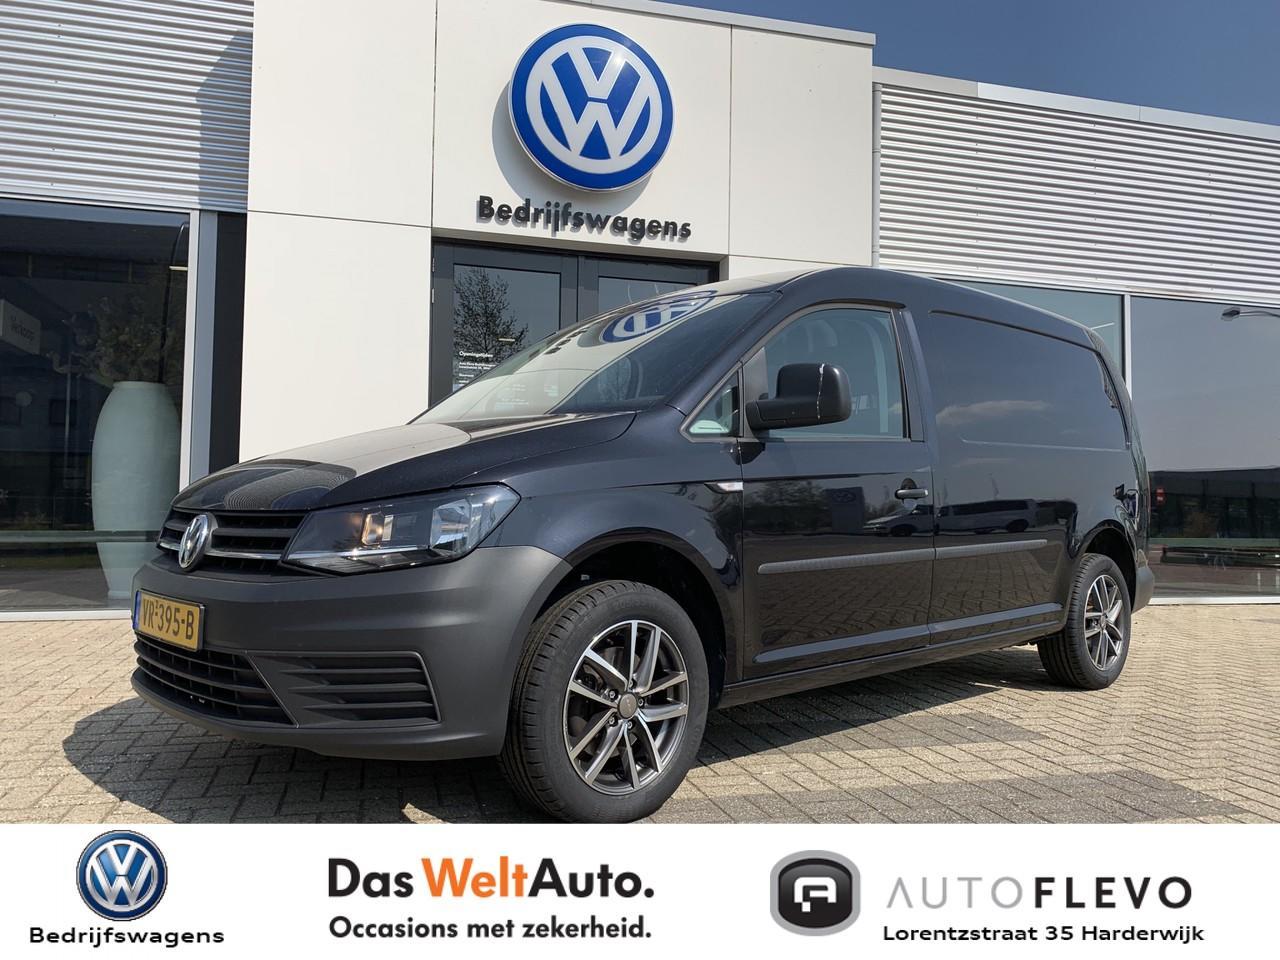 Volkswagen Caddy maxi 1.6 tdi l2h1 trendline airco / zwart / lichtmetalen velgen